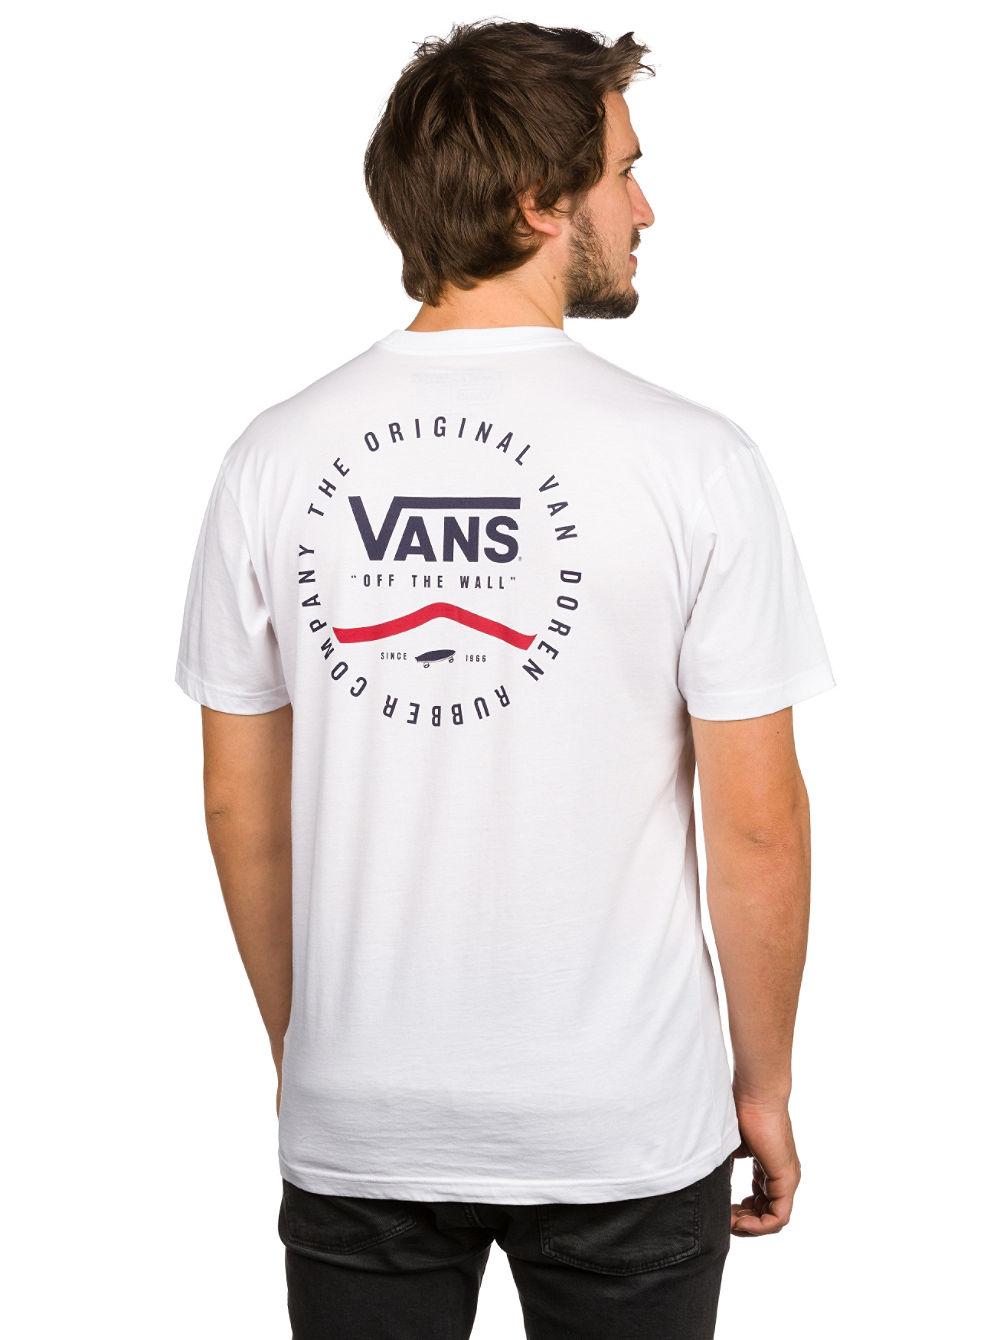 a4ba2ced52 Buy Vans Original Rubber Co T-Shirt online at Blue Tomato